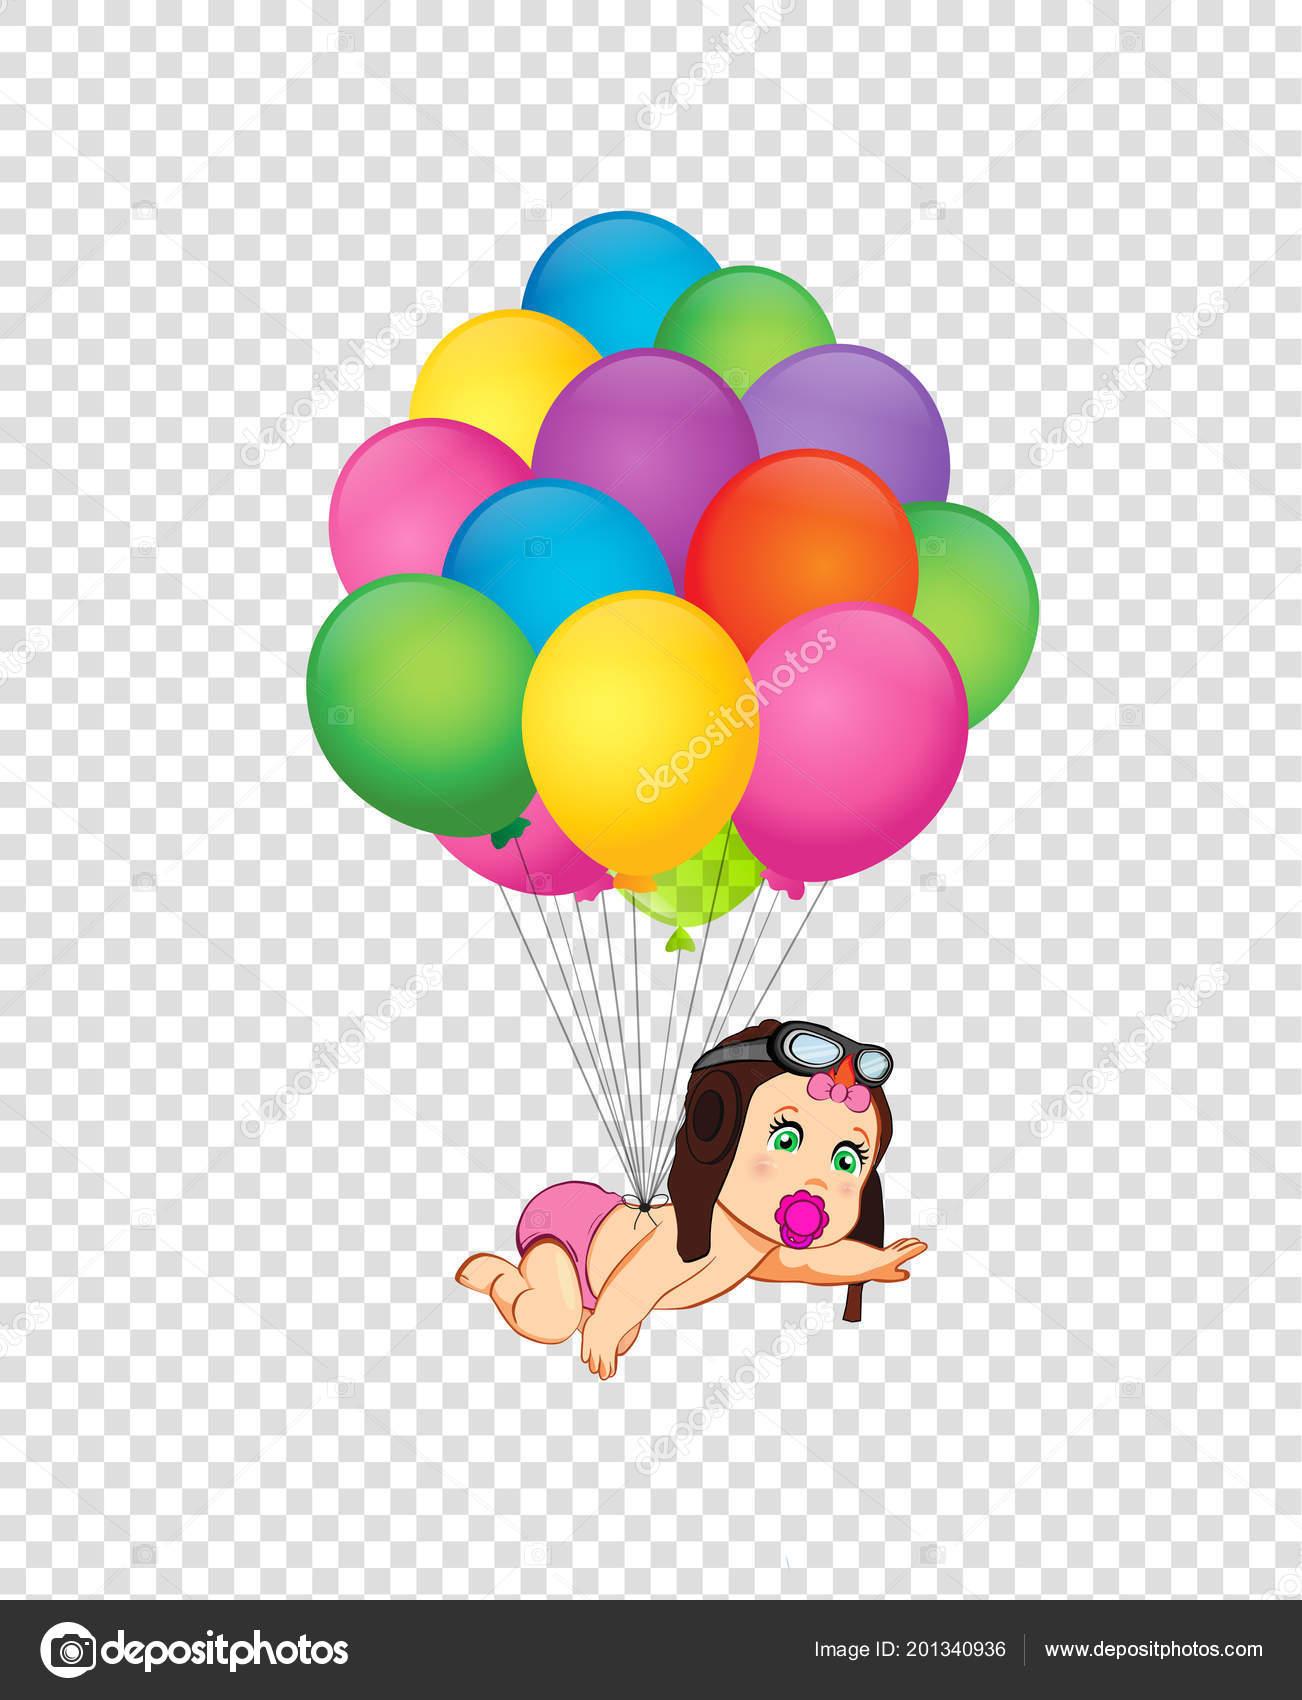 Aviator girl clipart birthday party clipart pilot party | Etsy